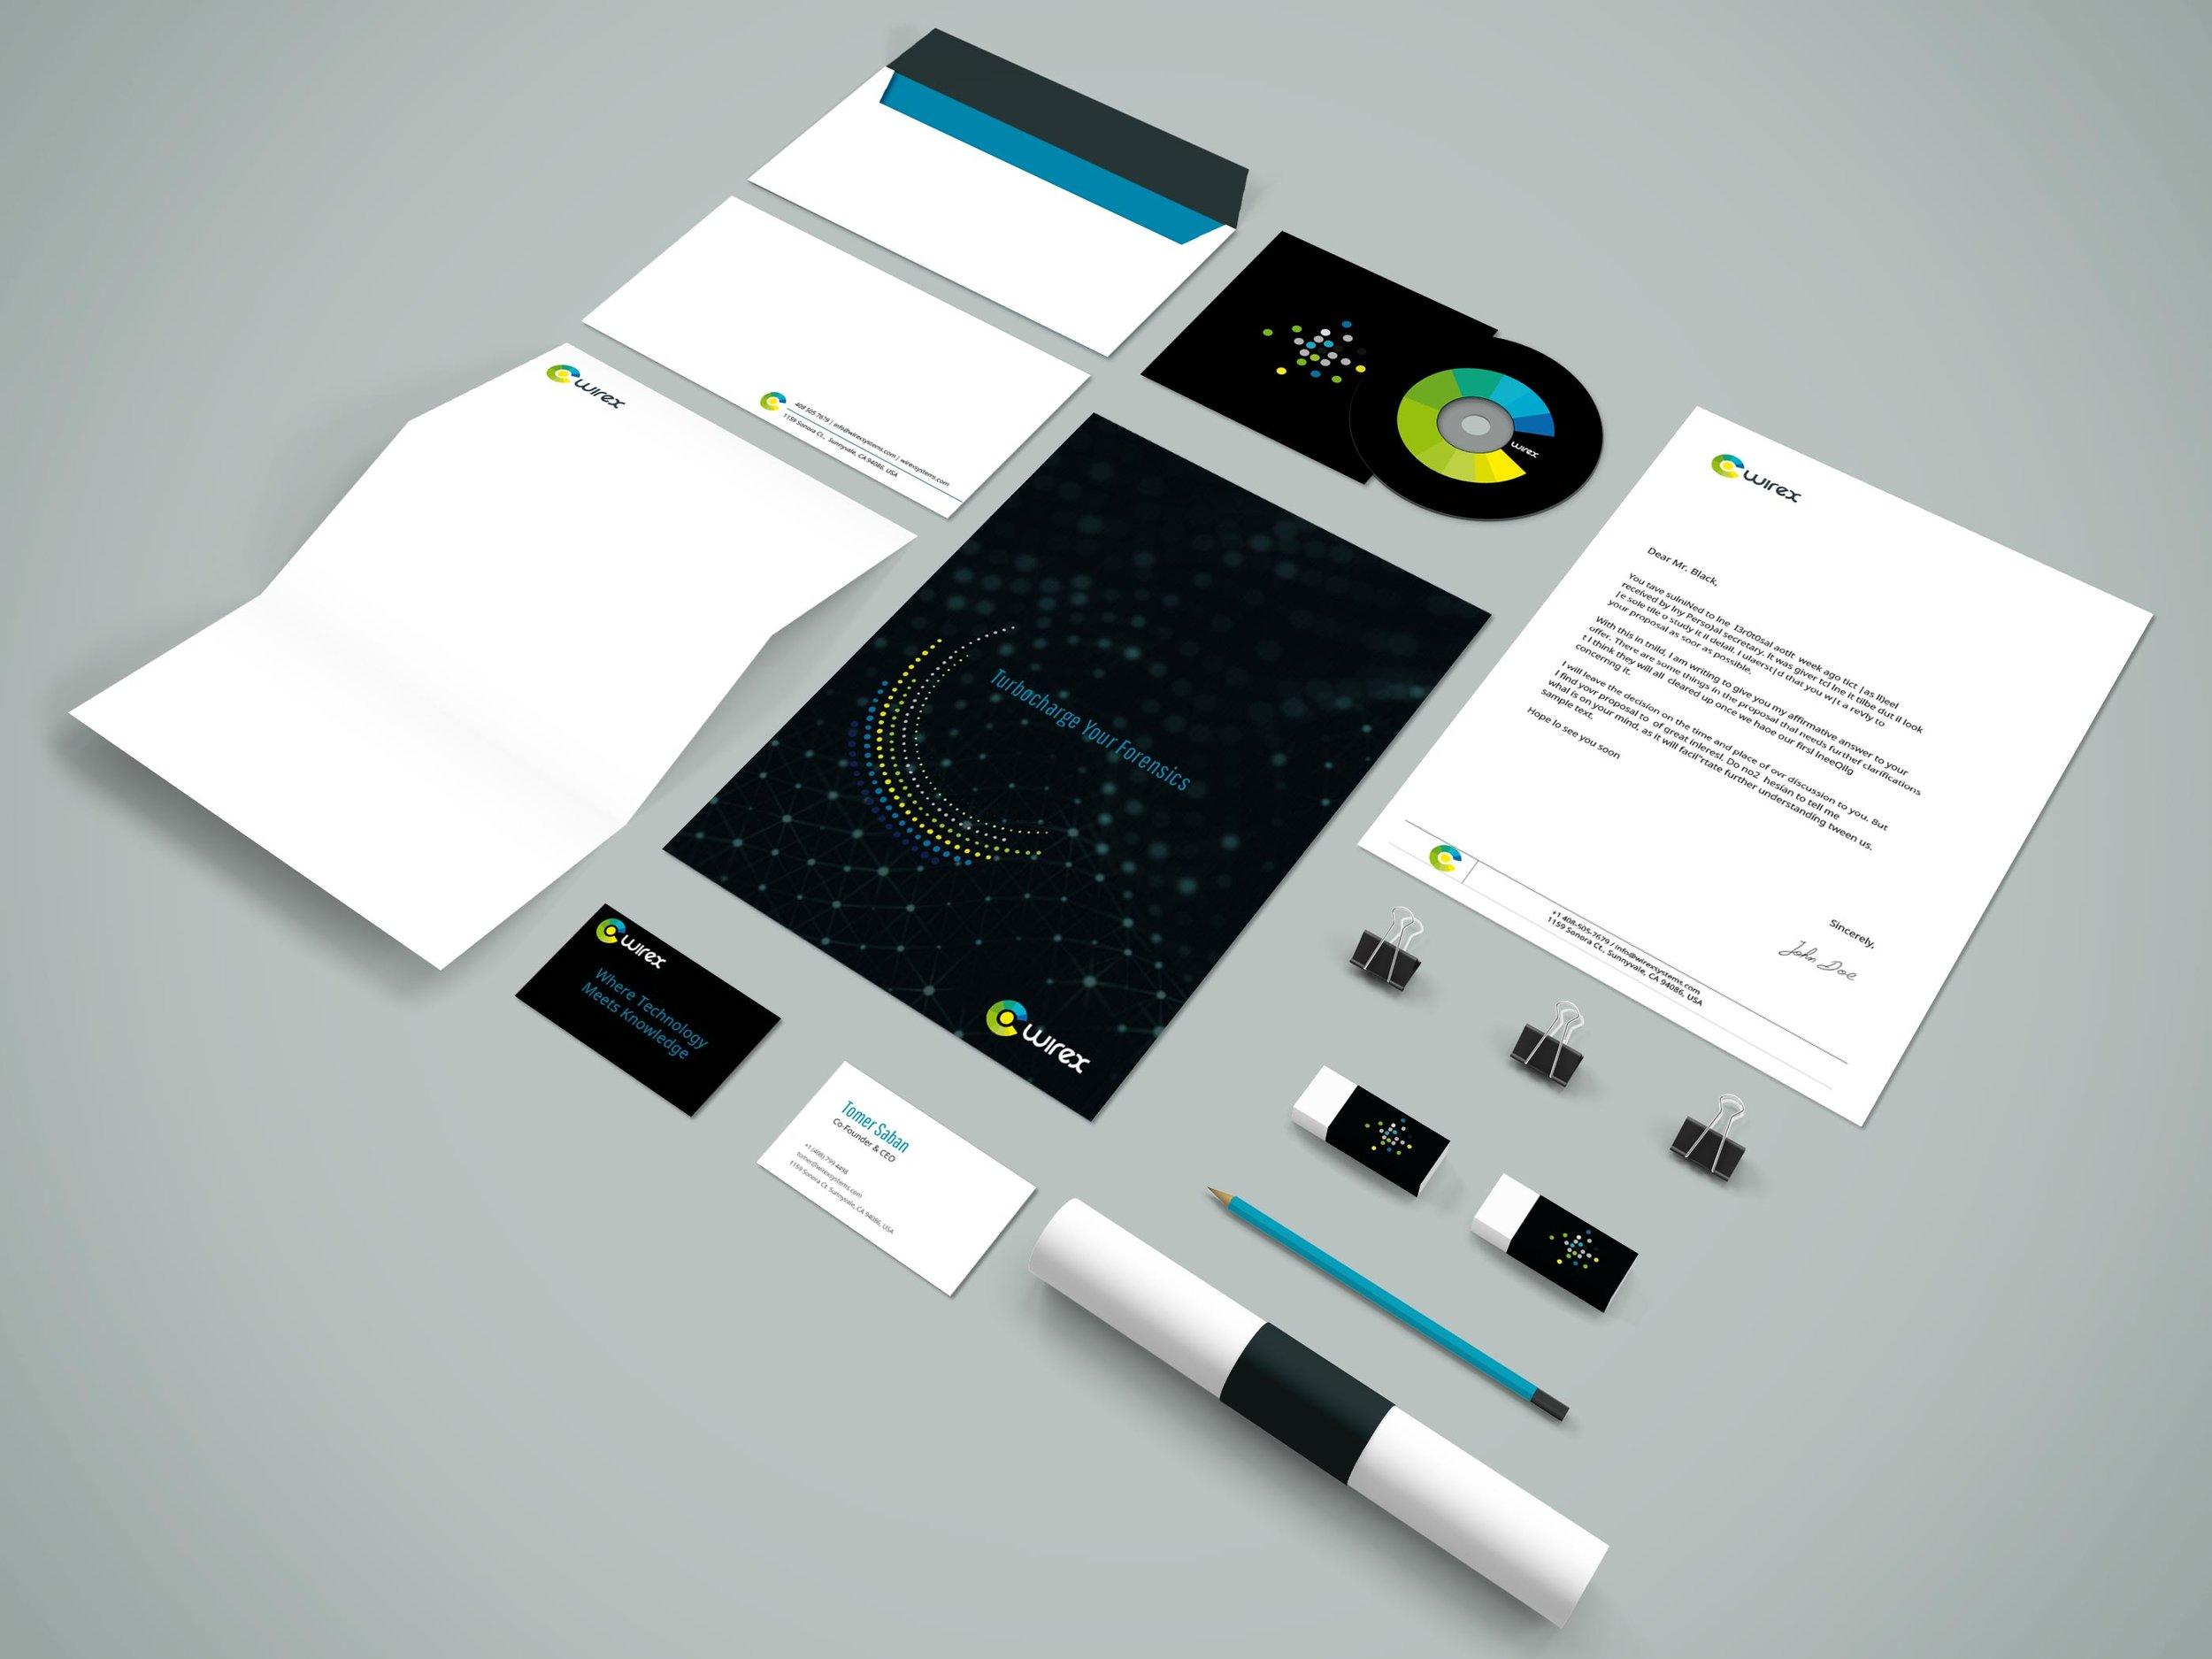 WireX Brand Identity Applications